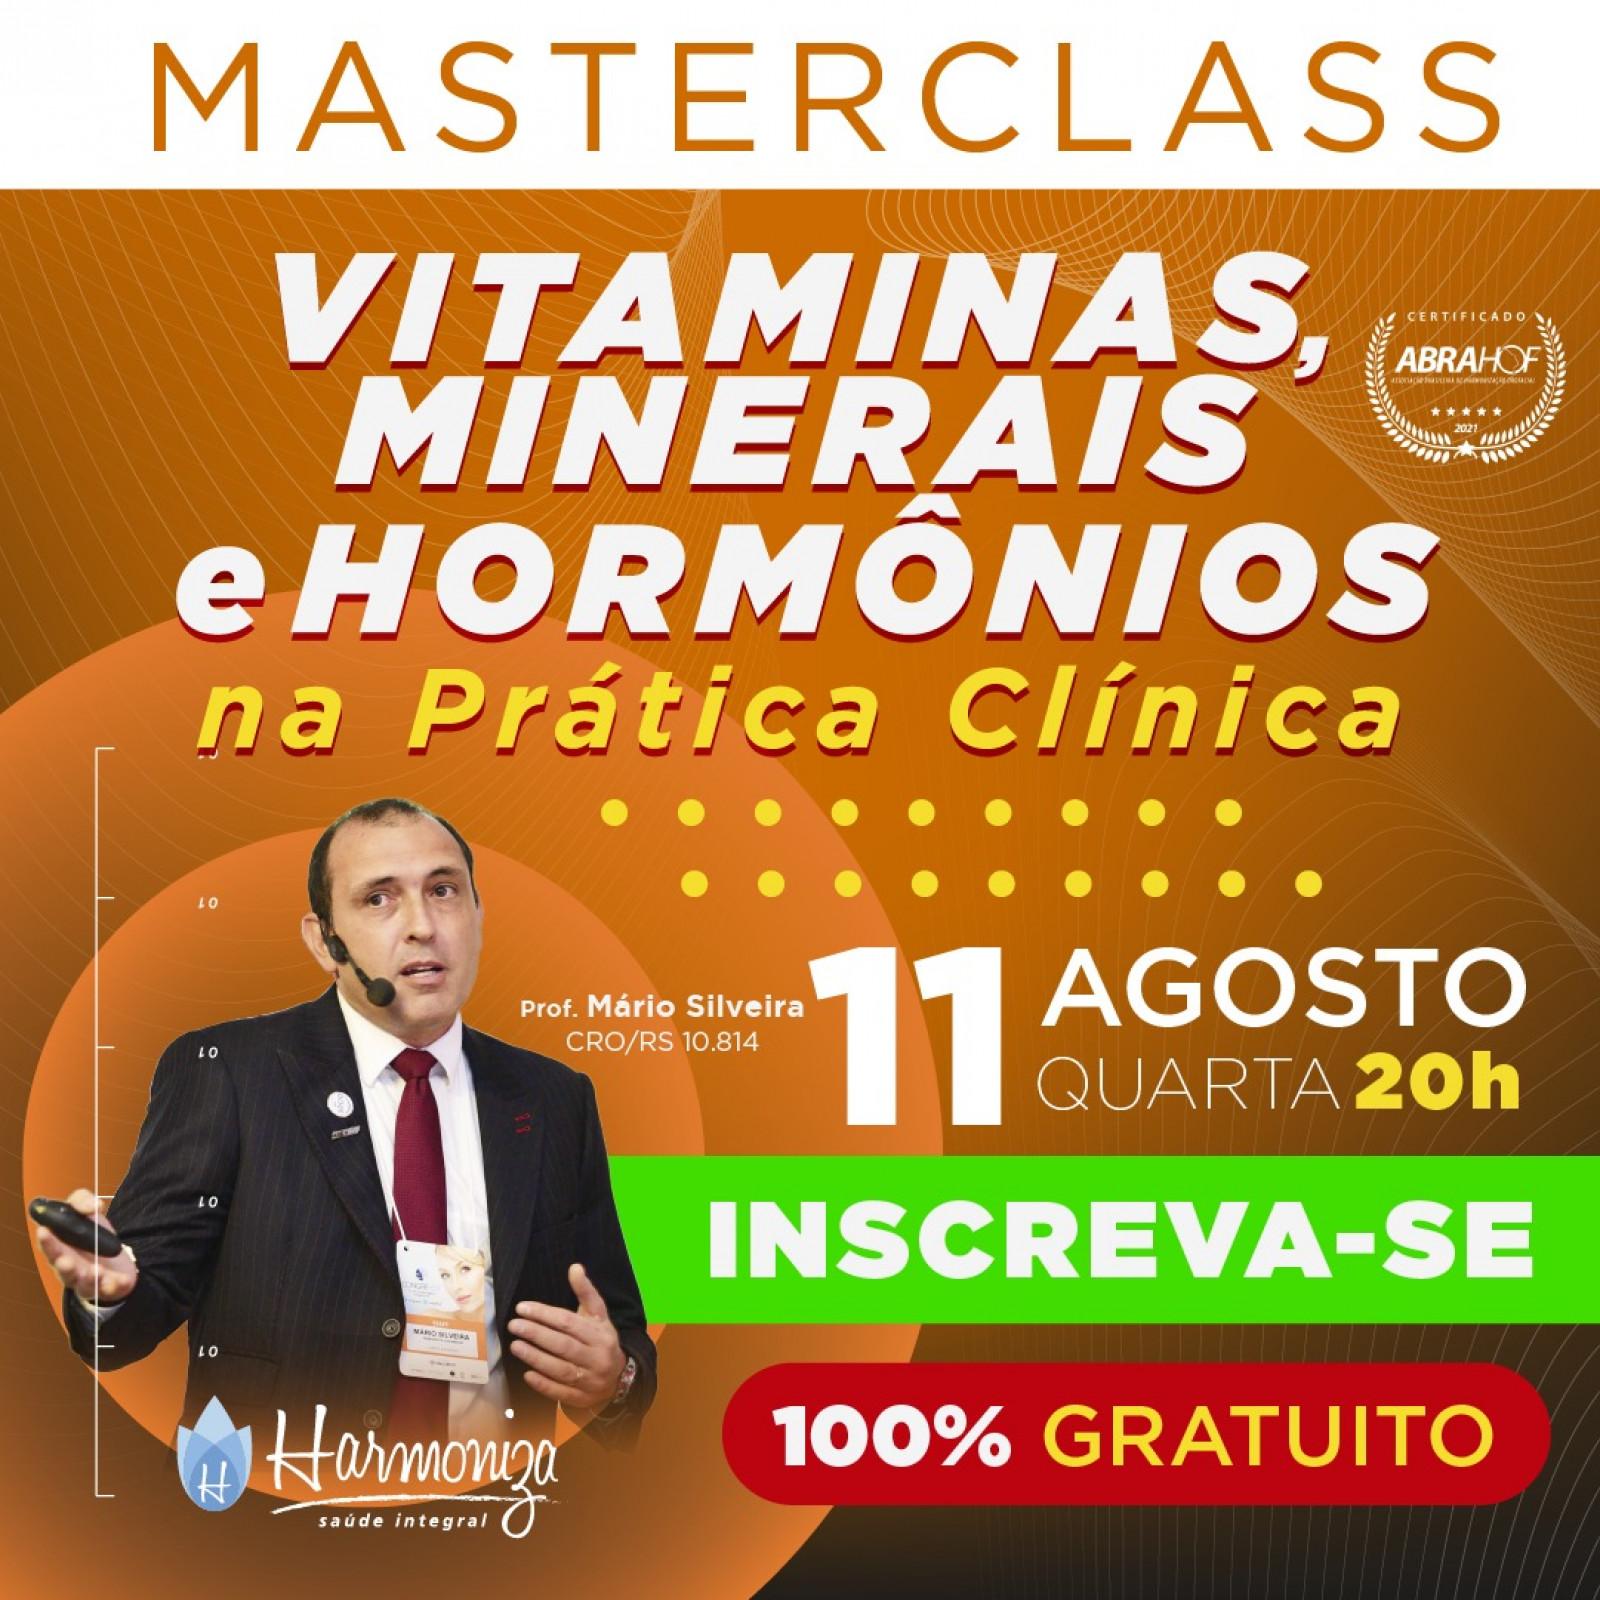 MasterClass:  Vitaminas, Minerais e Hormônios na prática clínica